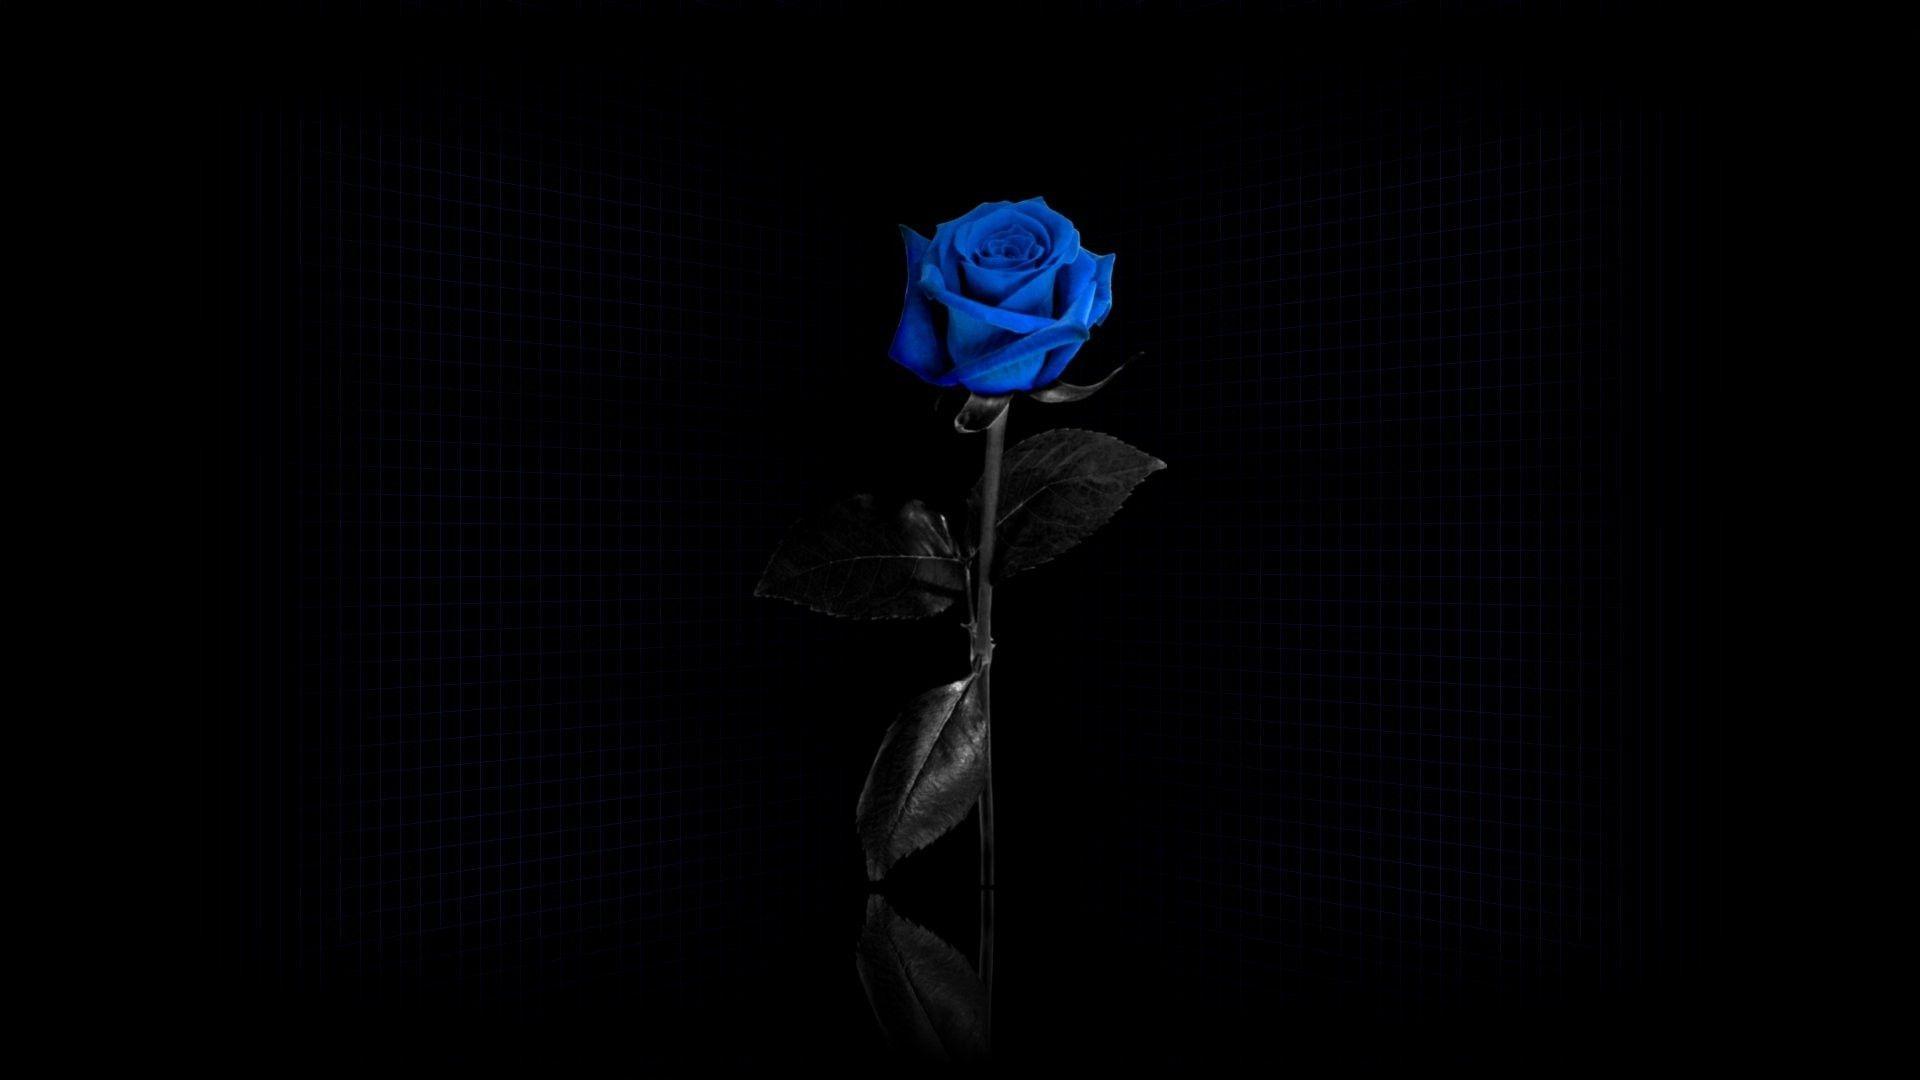 Blue Rose Wallpapers - Wallpaper Cave